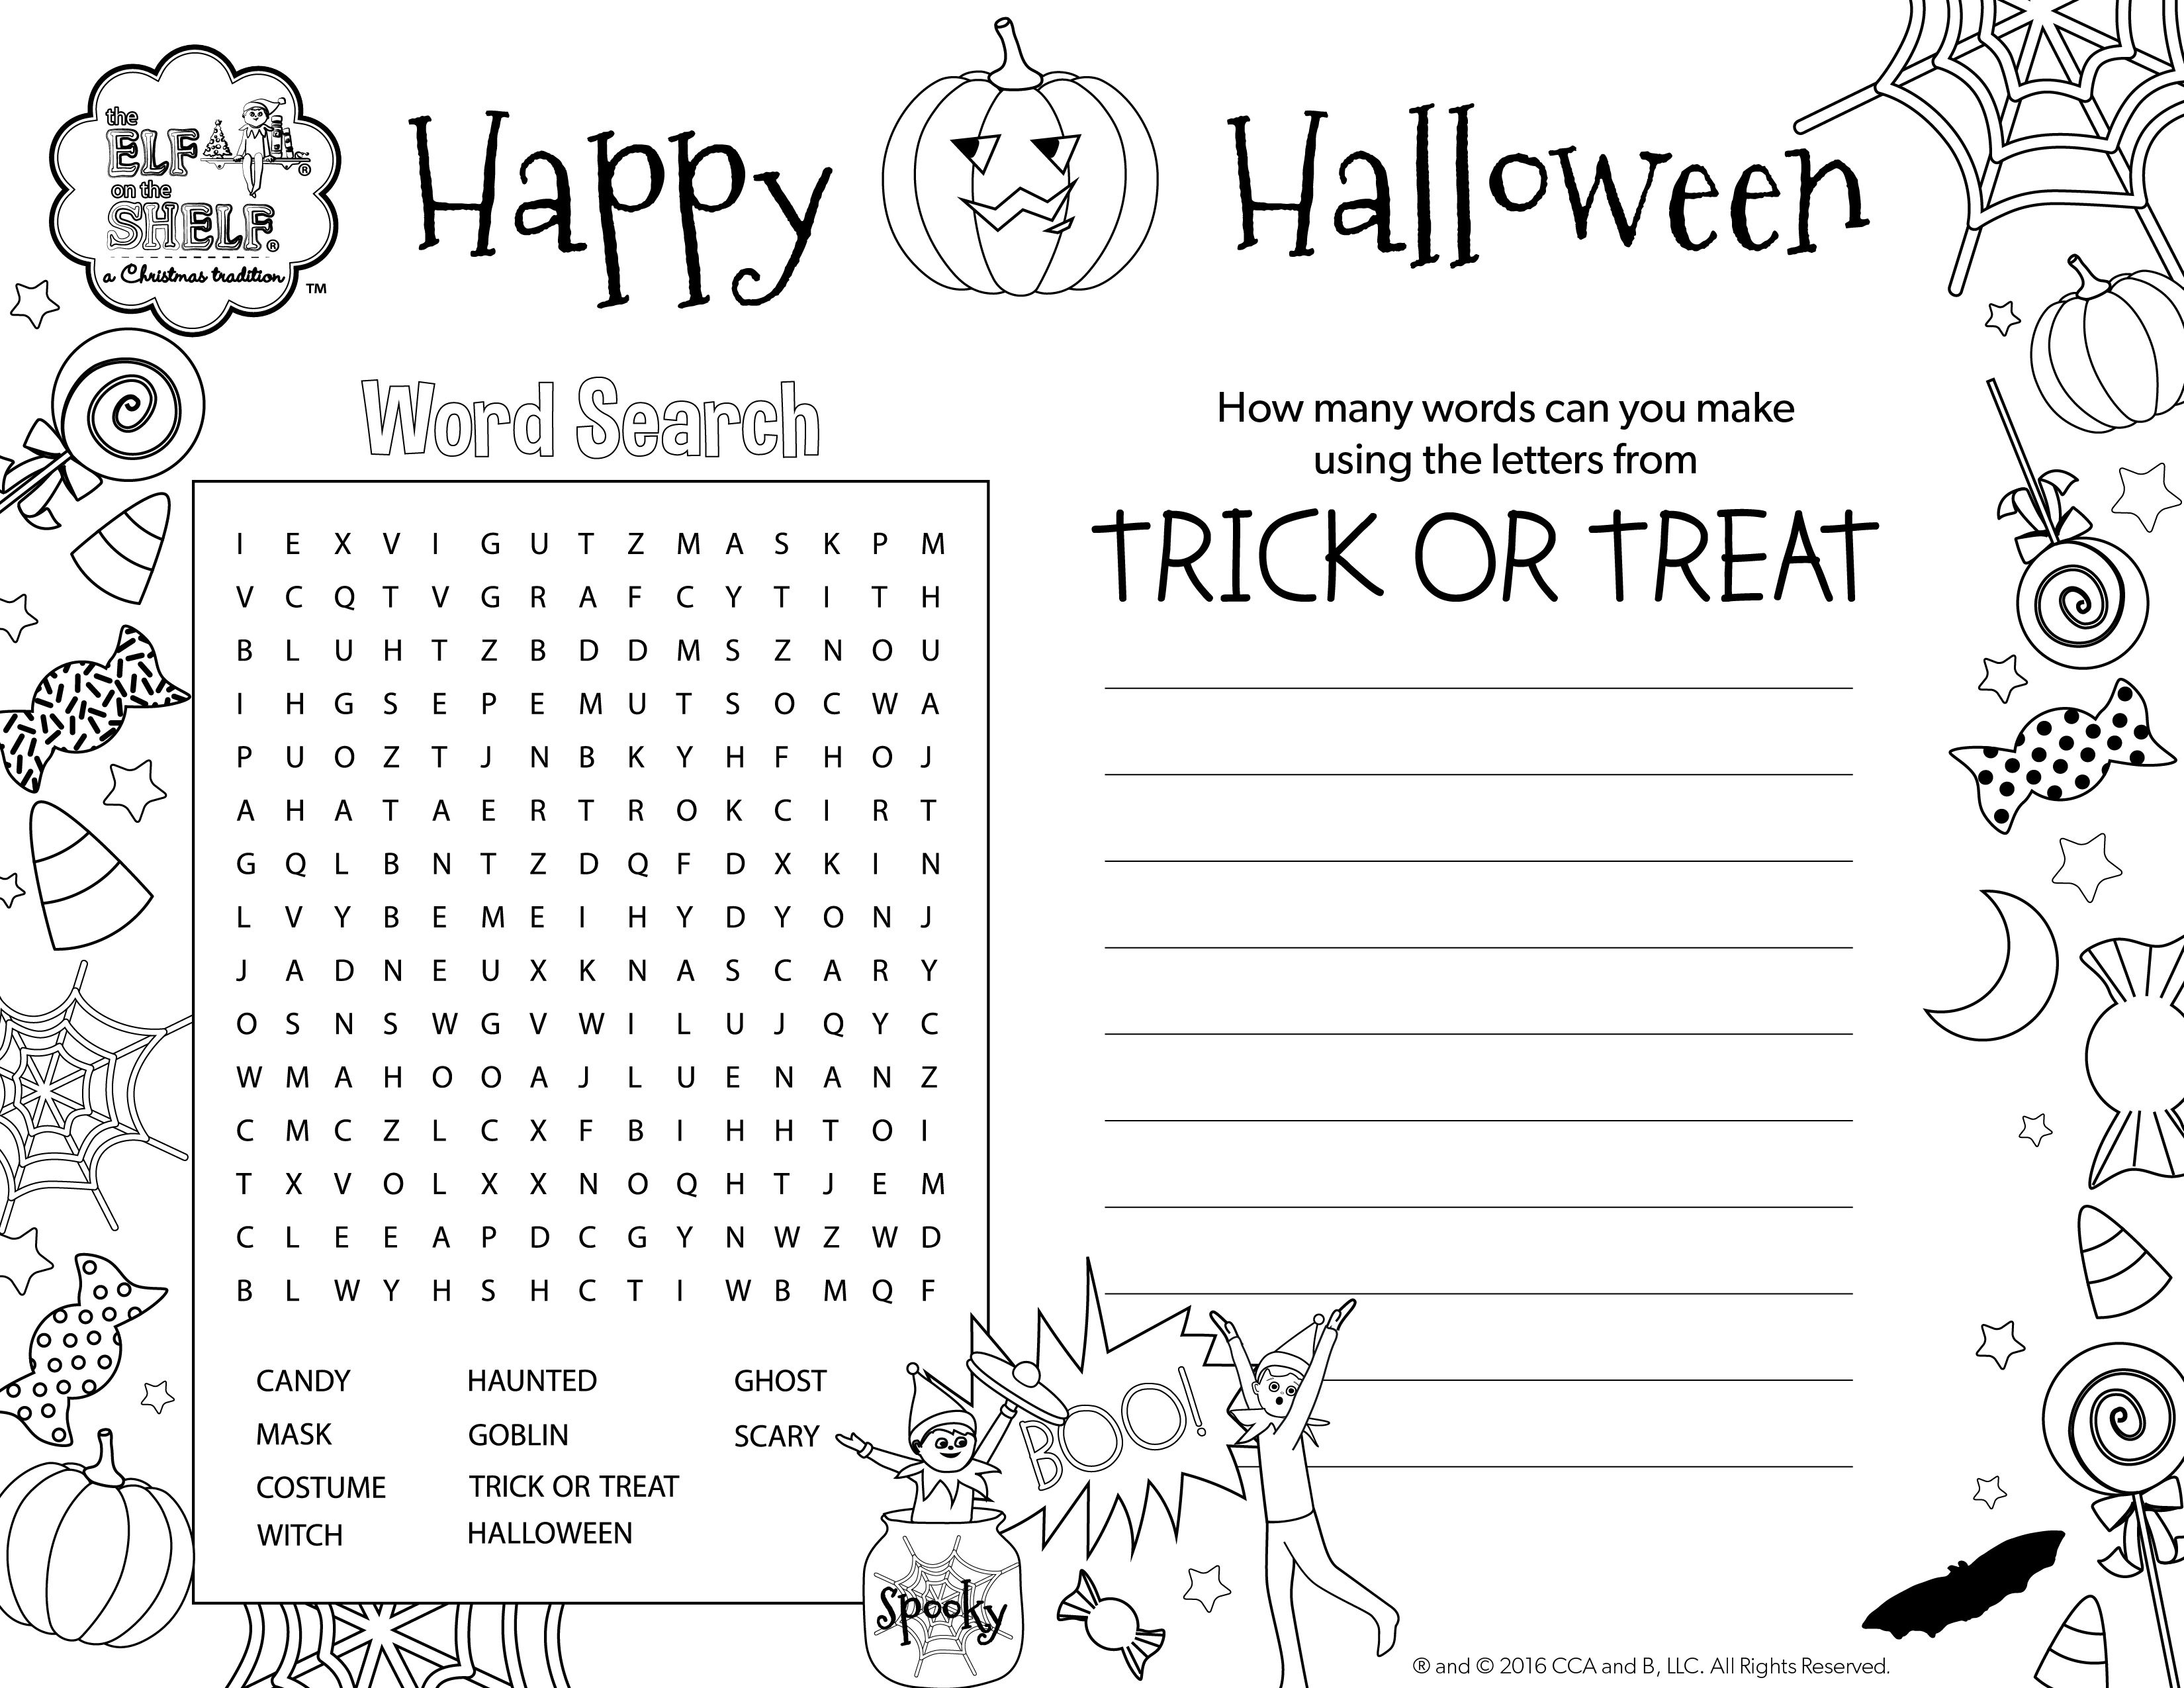 Halloween is just around the corner! Get in the spooky ...